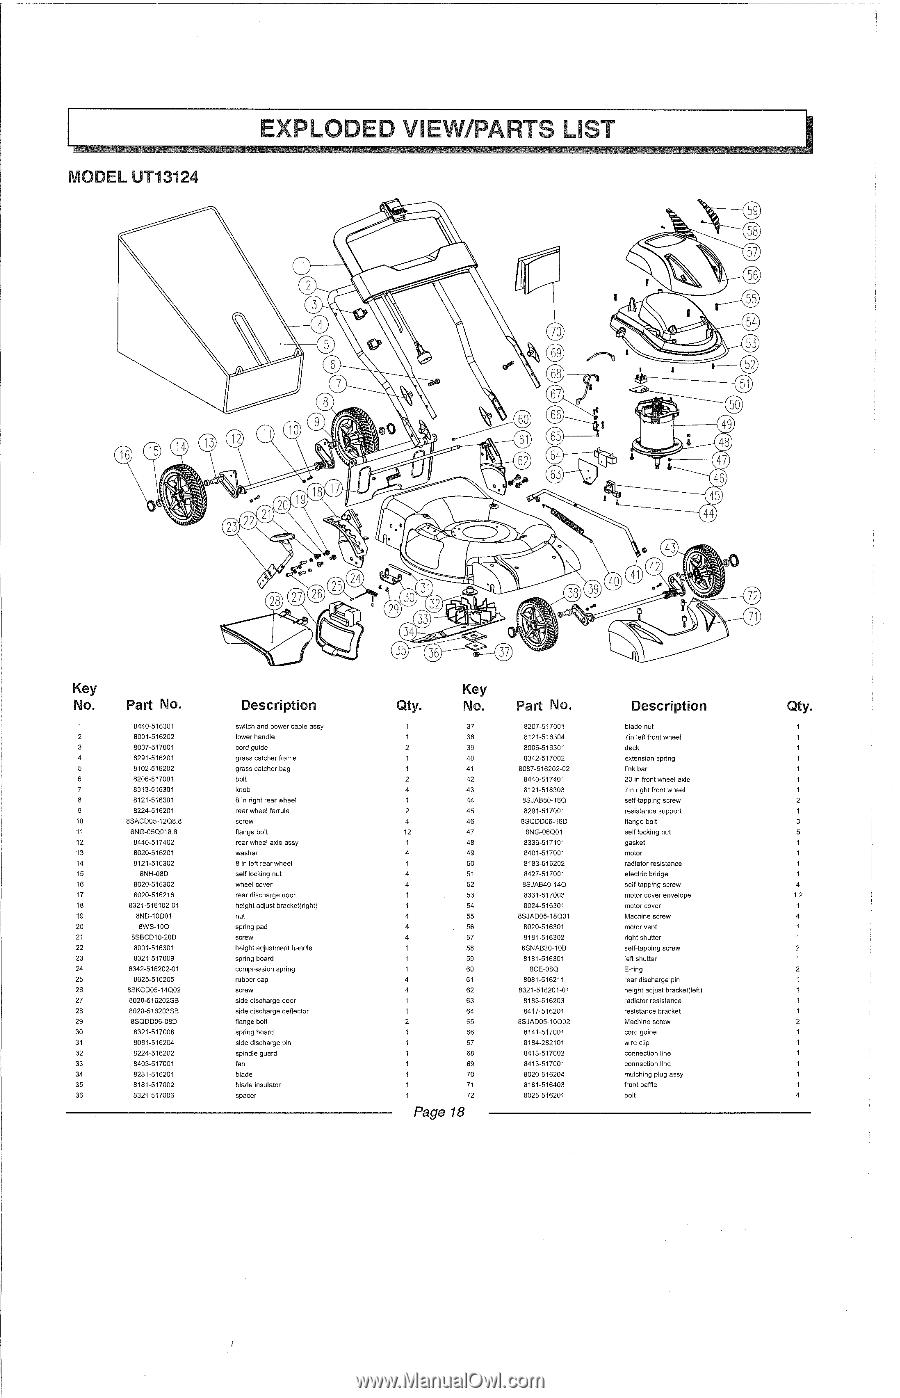 Homelite Ut13124 Parts List. 1 Home Manual. Wiring. Homelite Ut13124 Parts Diagram At Scoala.co